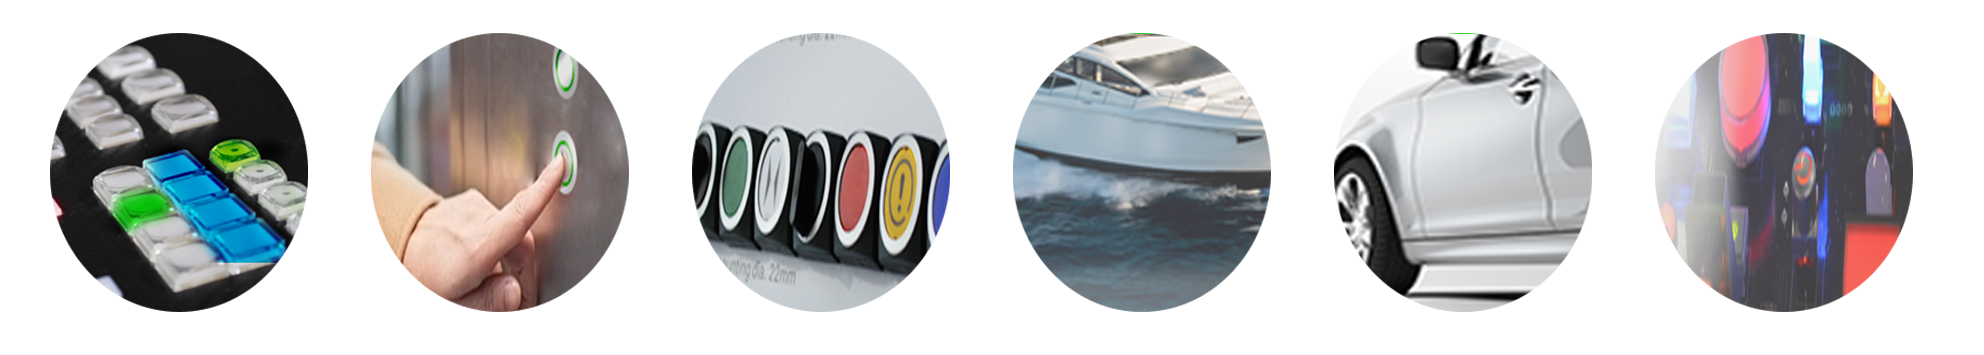 Applications RJS Electronics Ltd. Audio, Broadcasting, Video, Radio, MEdical, Automotive, Industrial Controls, Boat Building and Marine. RJS Electronics Ltd.